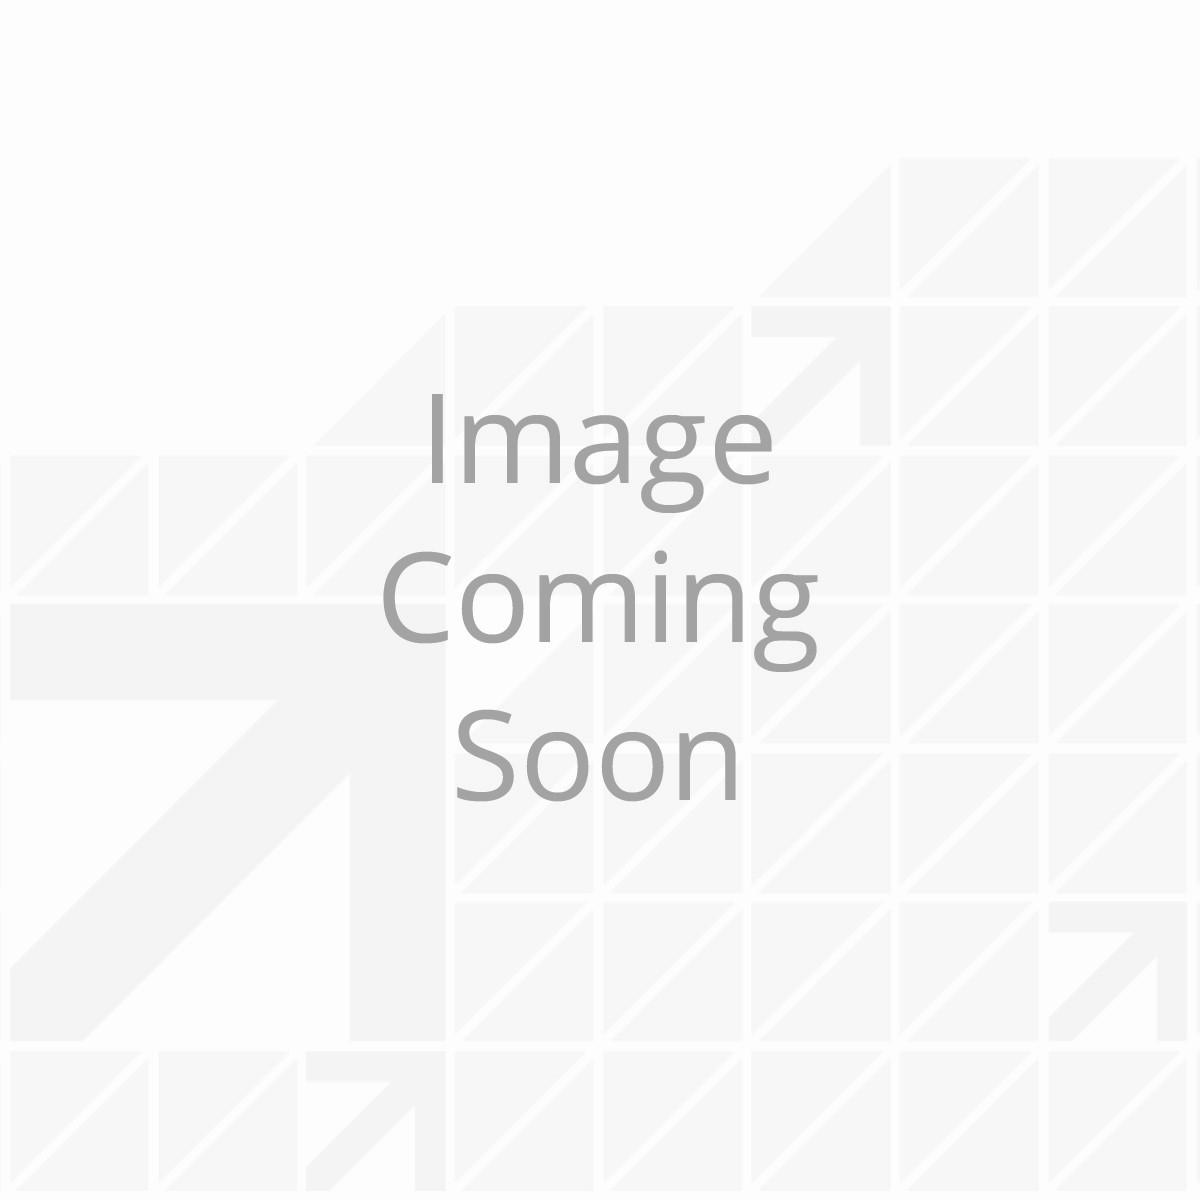 729125_Observation-System-FOS43TASF_001